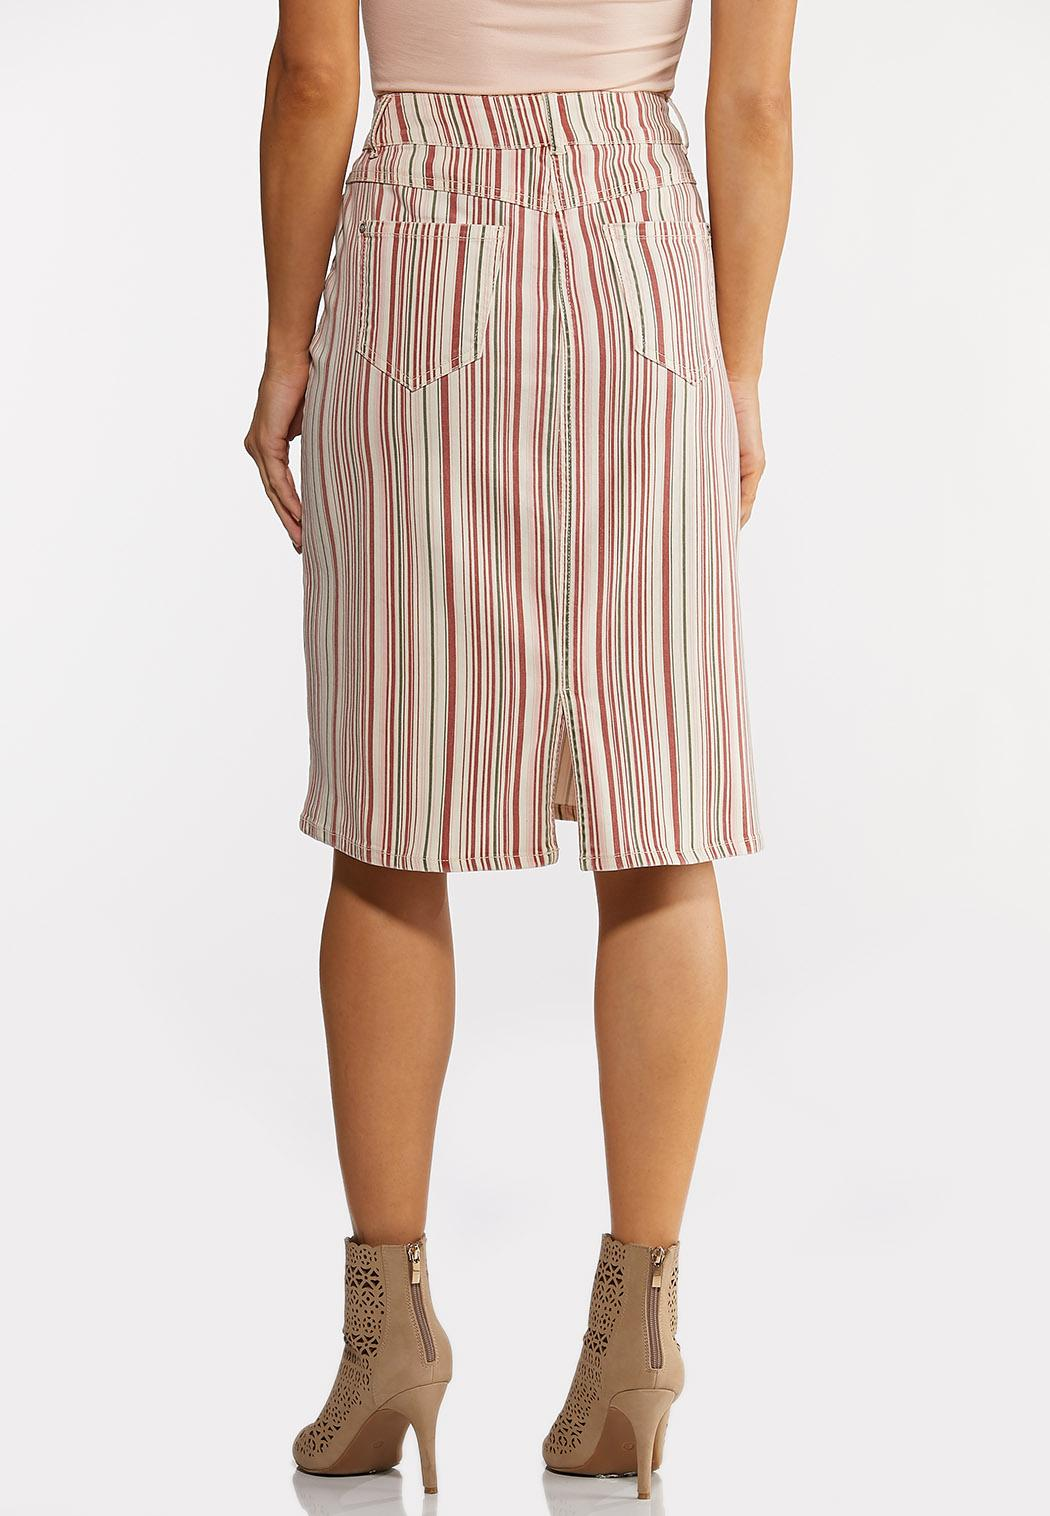 Blushing Stripe Denim Skirt (Item #44176568)